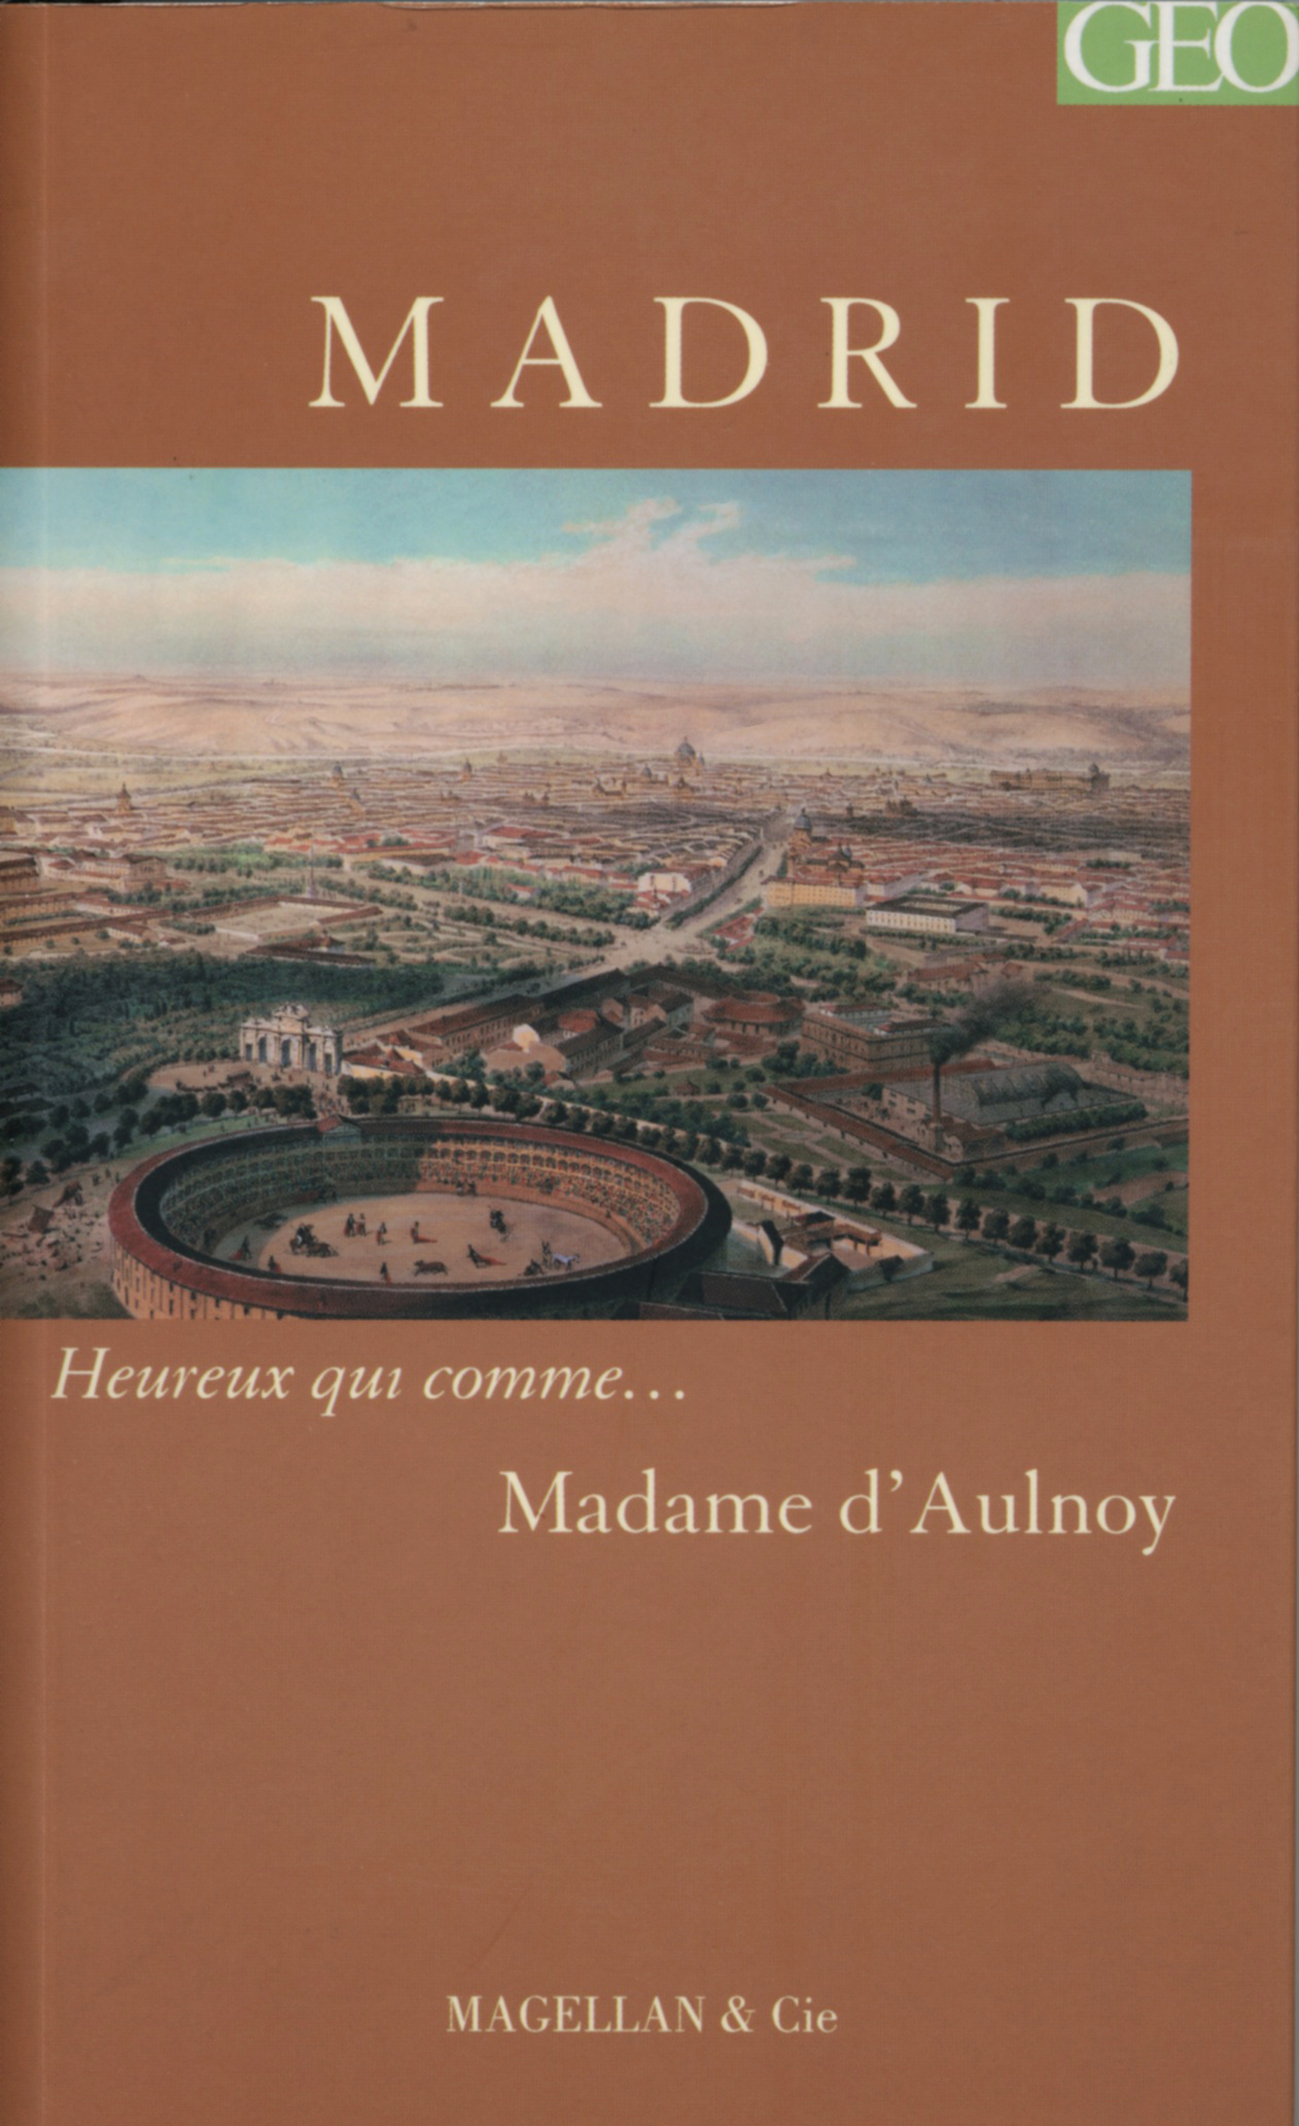 MADRID  - D'AULNOY MADAME